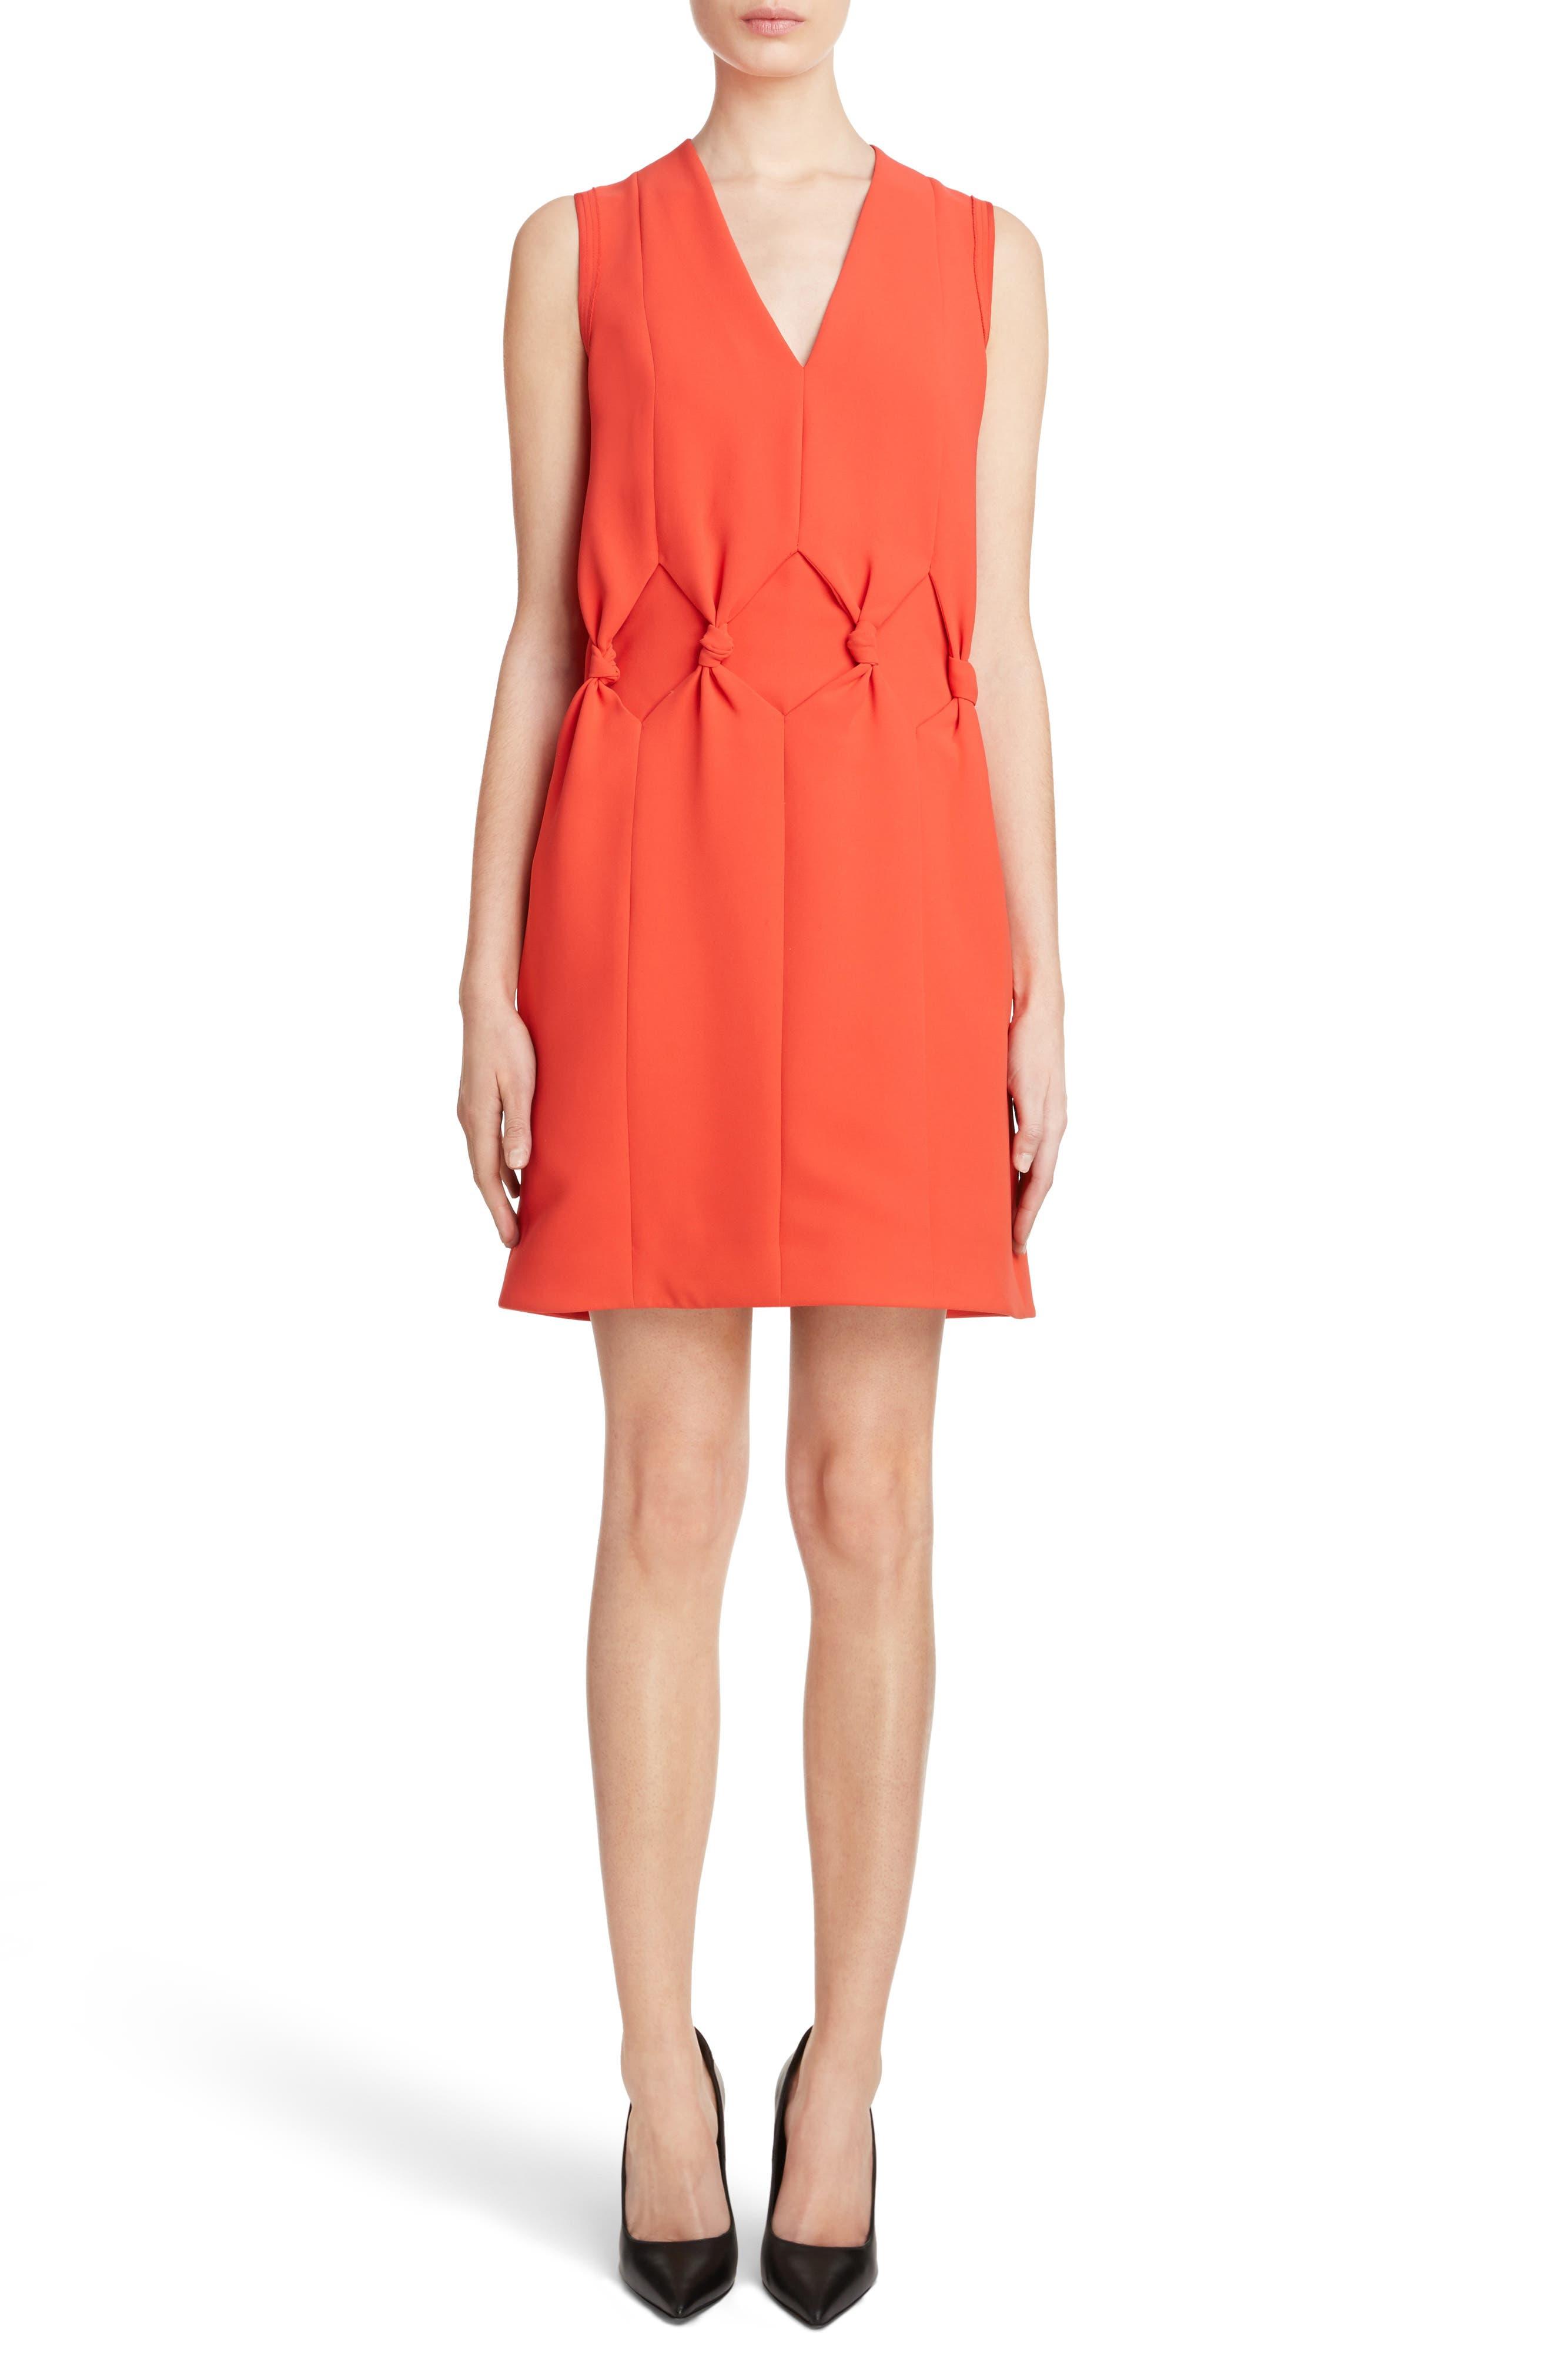 Main Image - Victoria, Victoria Beckham Knot Front Dress